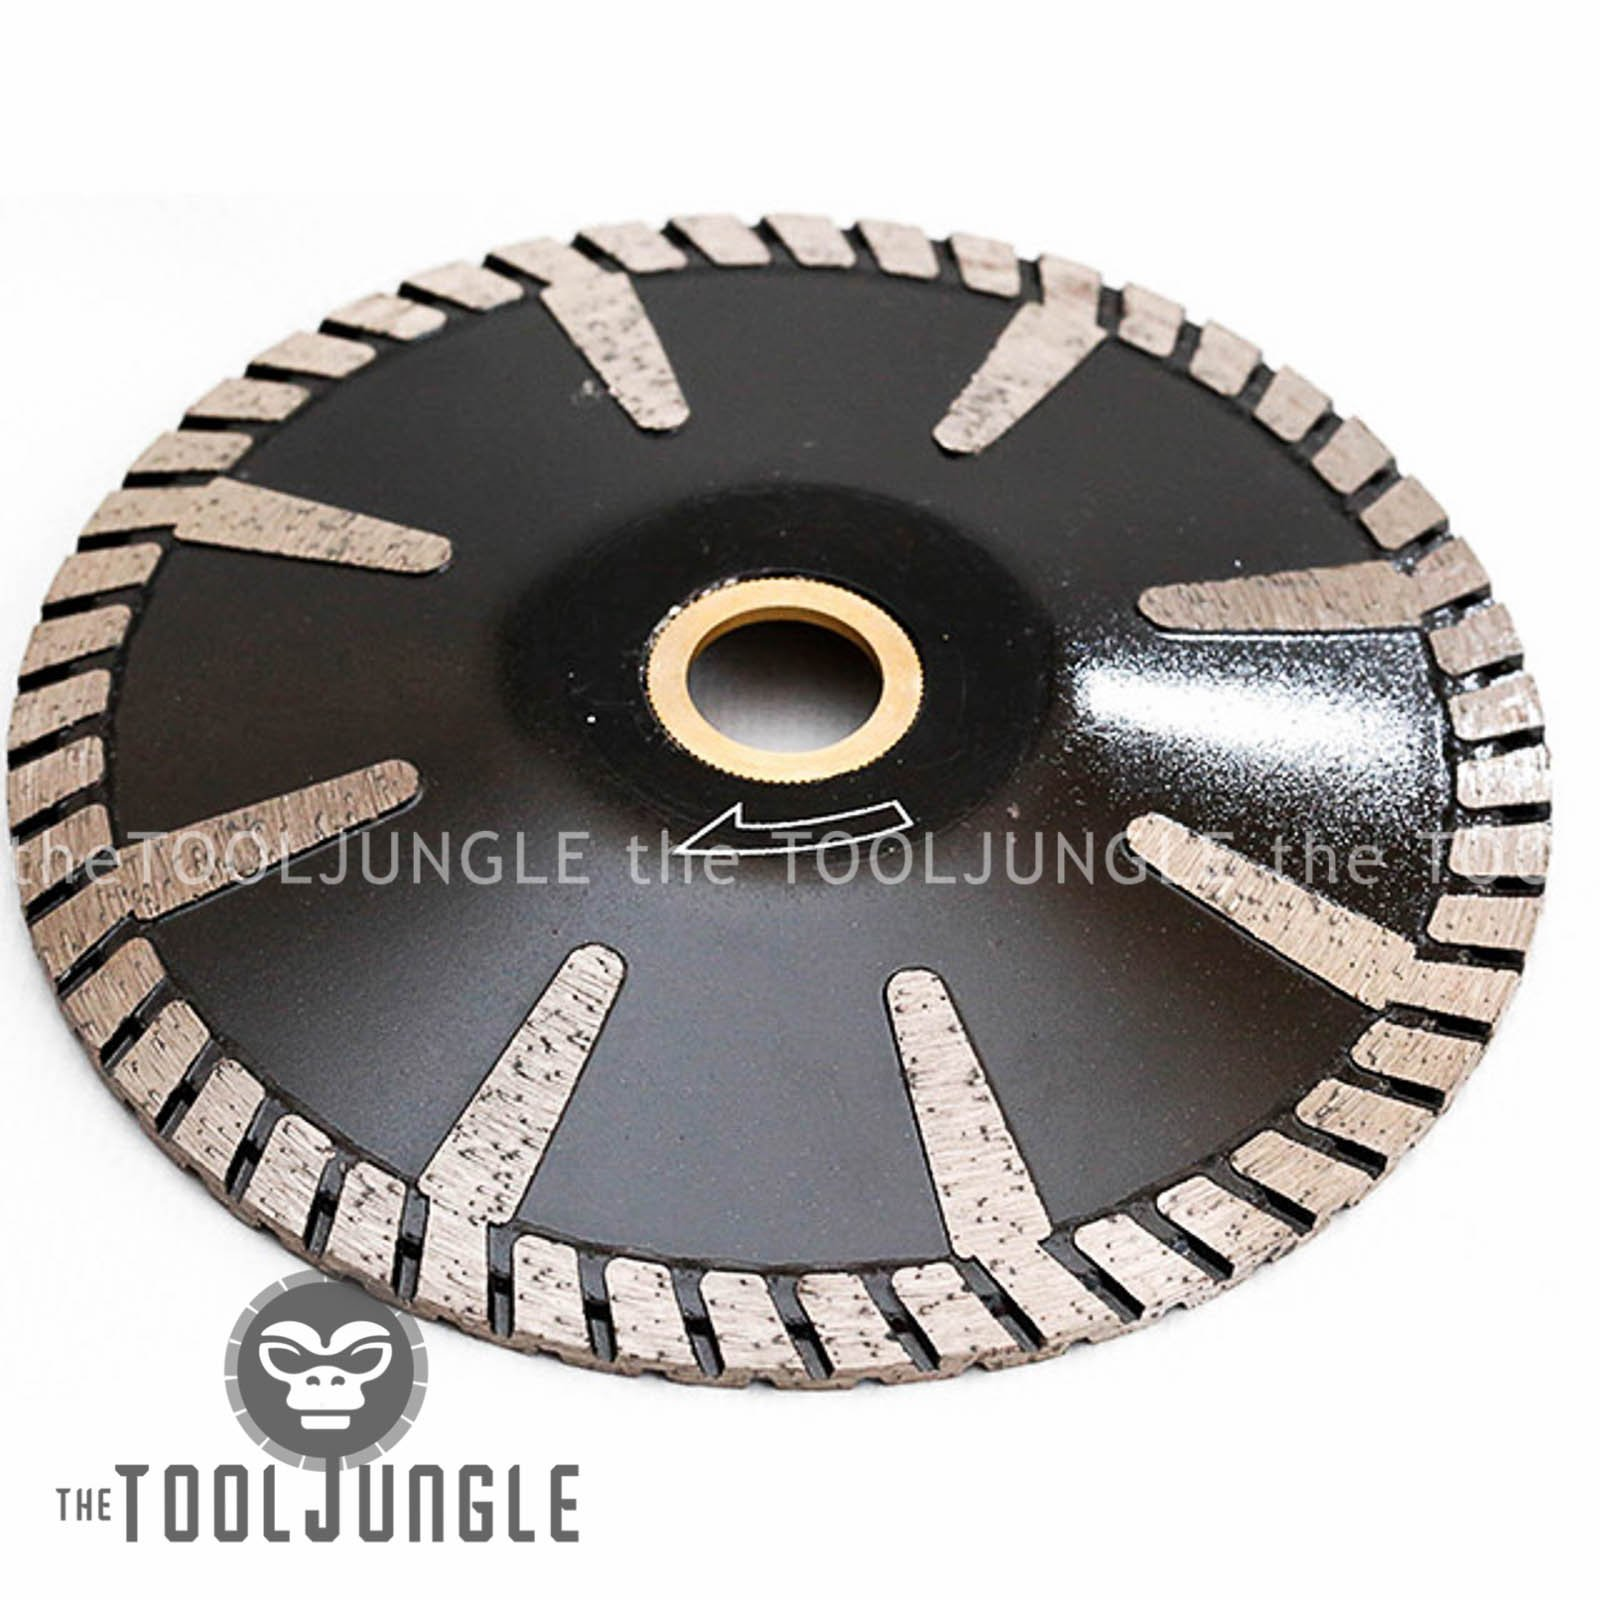 5'' Diamond Turbo Blade Convex Sink Cutter Wet/DRY Granite Stone Concrete by Tiburon